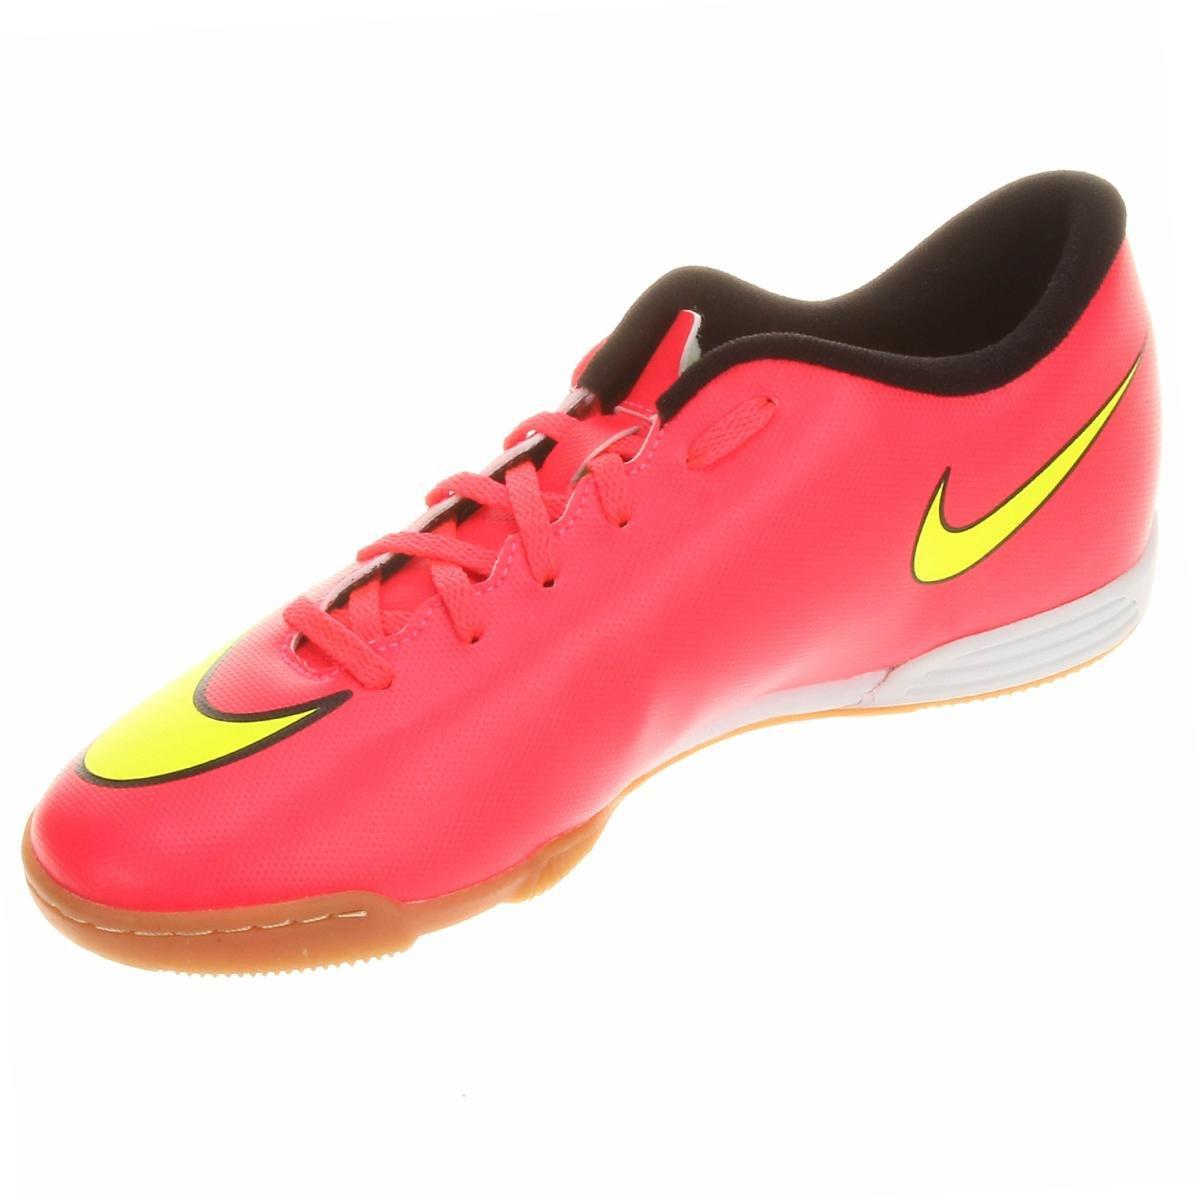 Chuteira Futsal Nike Mercurial Vortex 2 IC - Compre Agora   Loja do ... c7c6d5da59